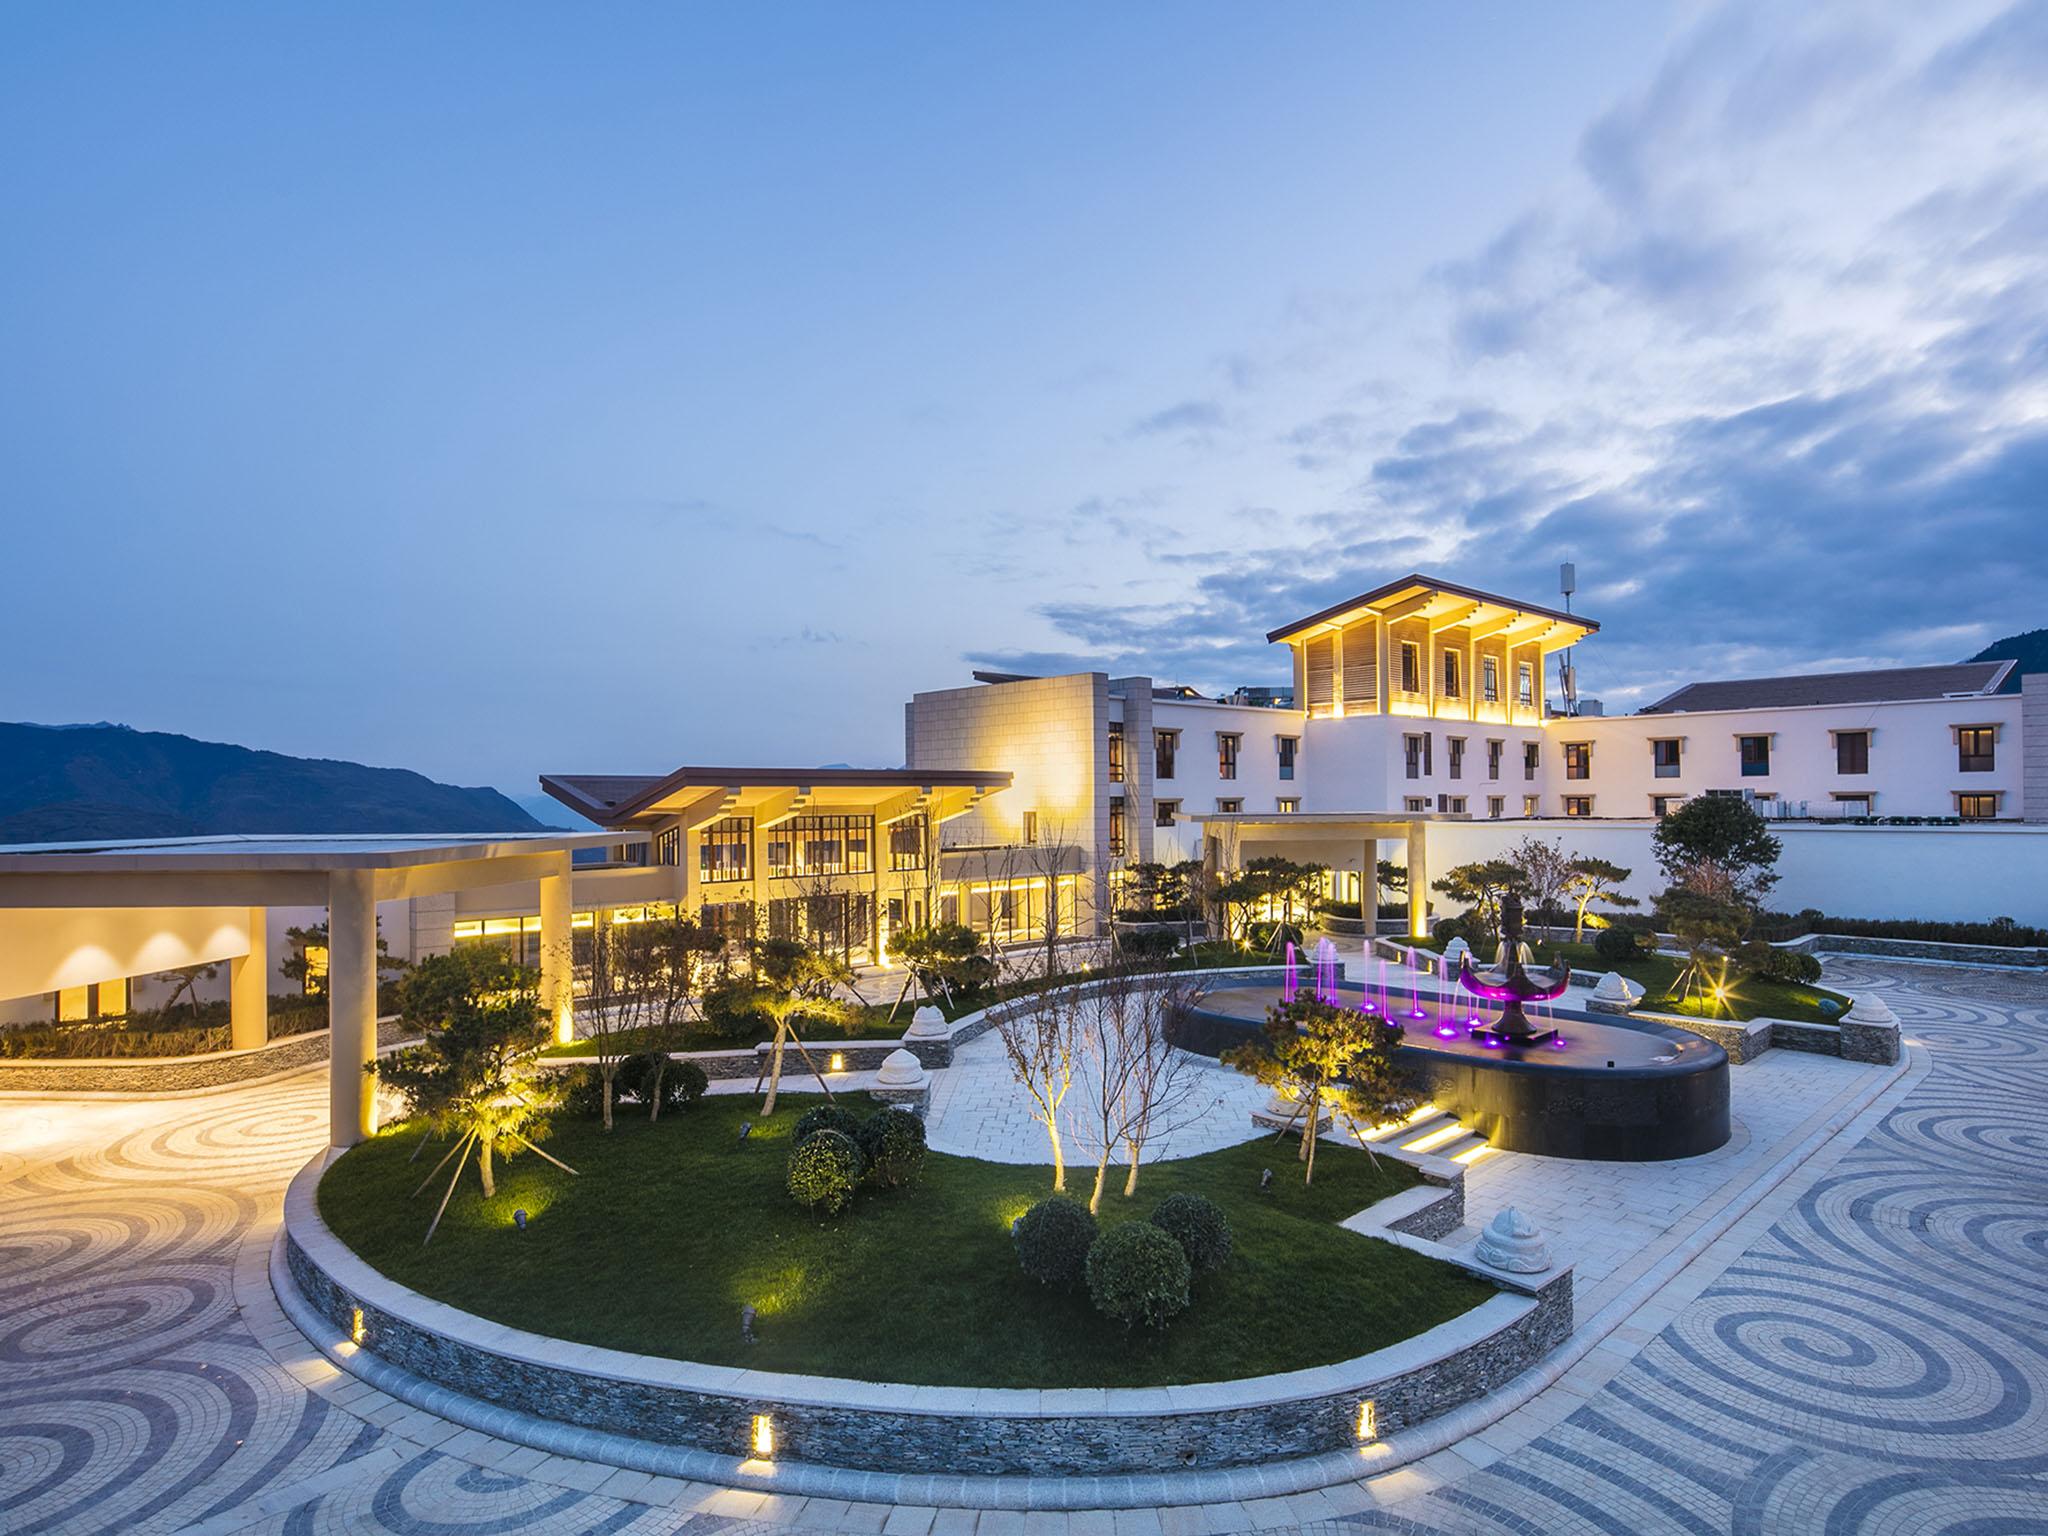 Отель — Banyan Tree Цзючжайгоу